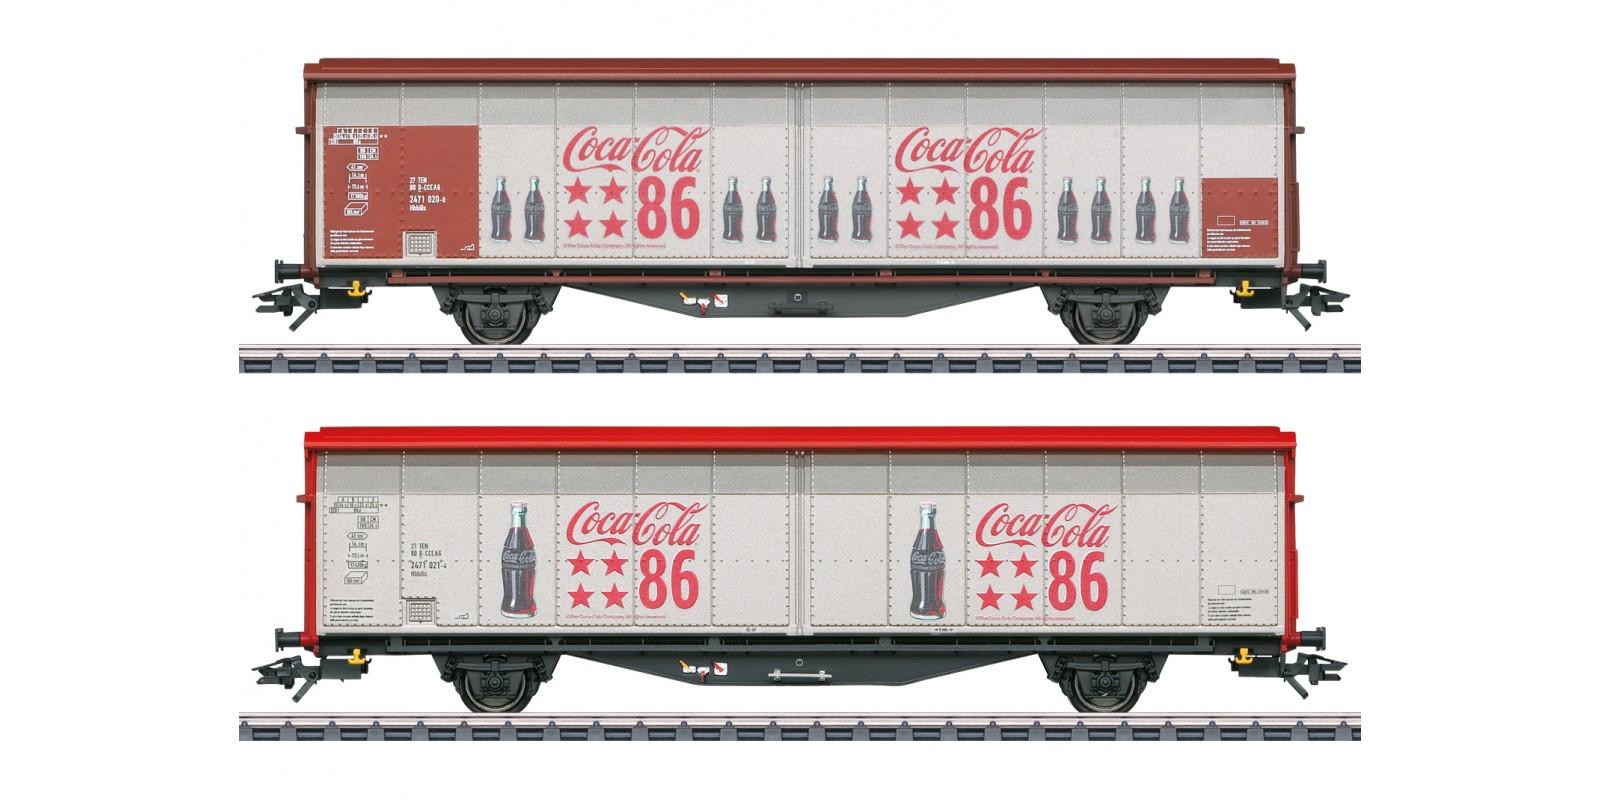 048345 Type Hbbills Sliding Wall Boxcar Set